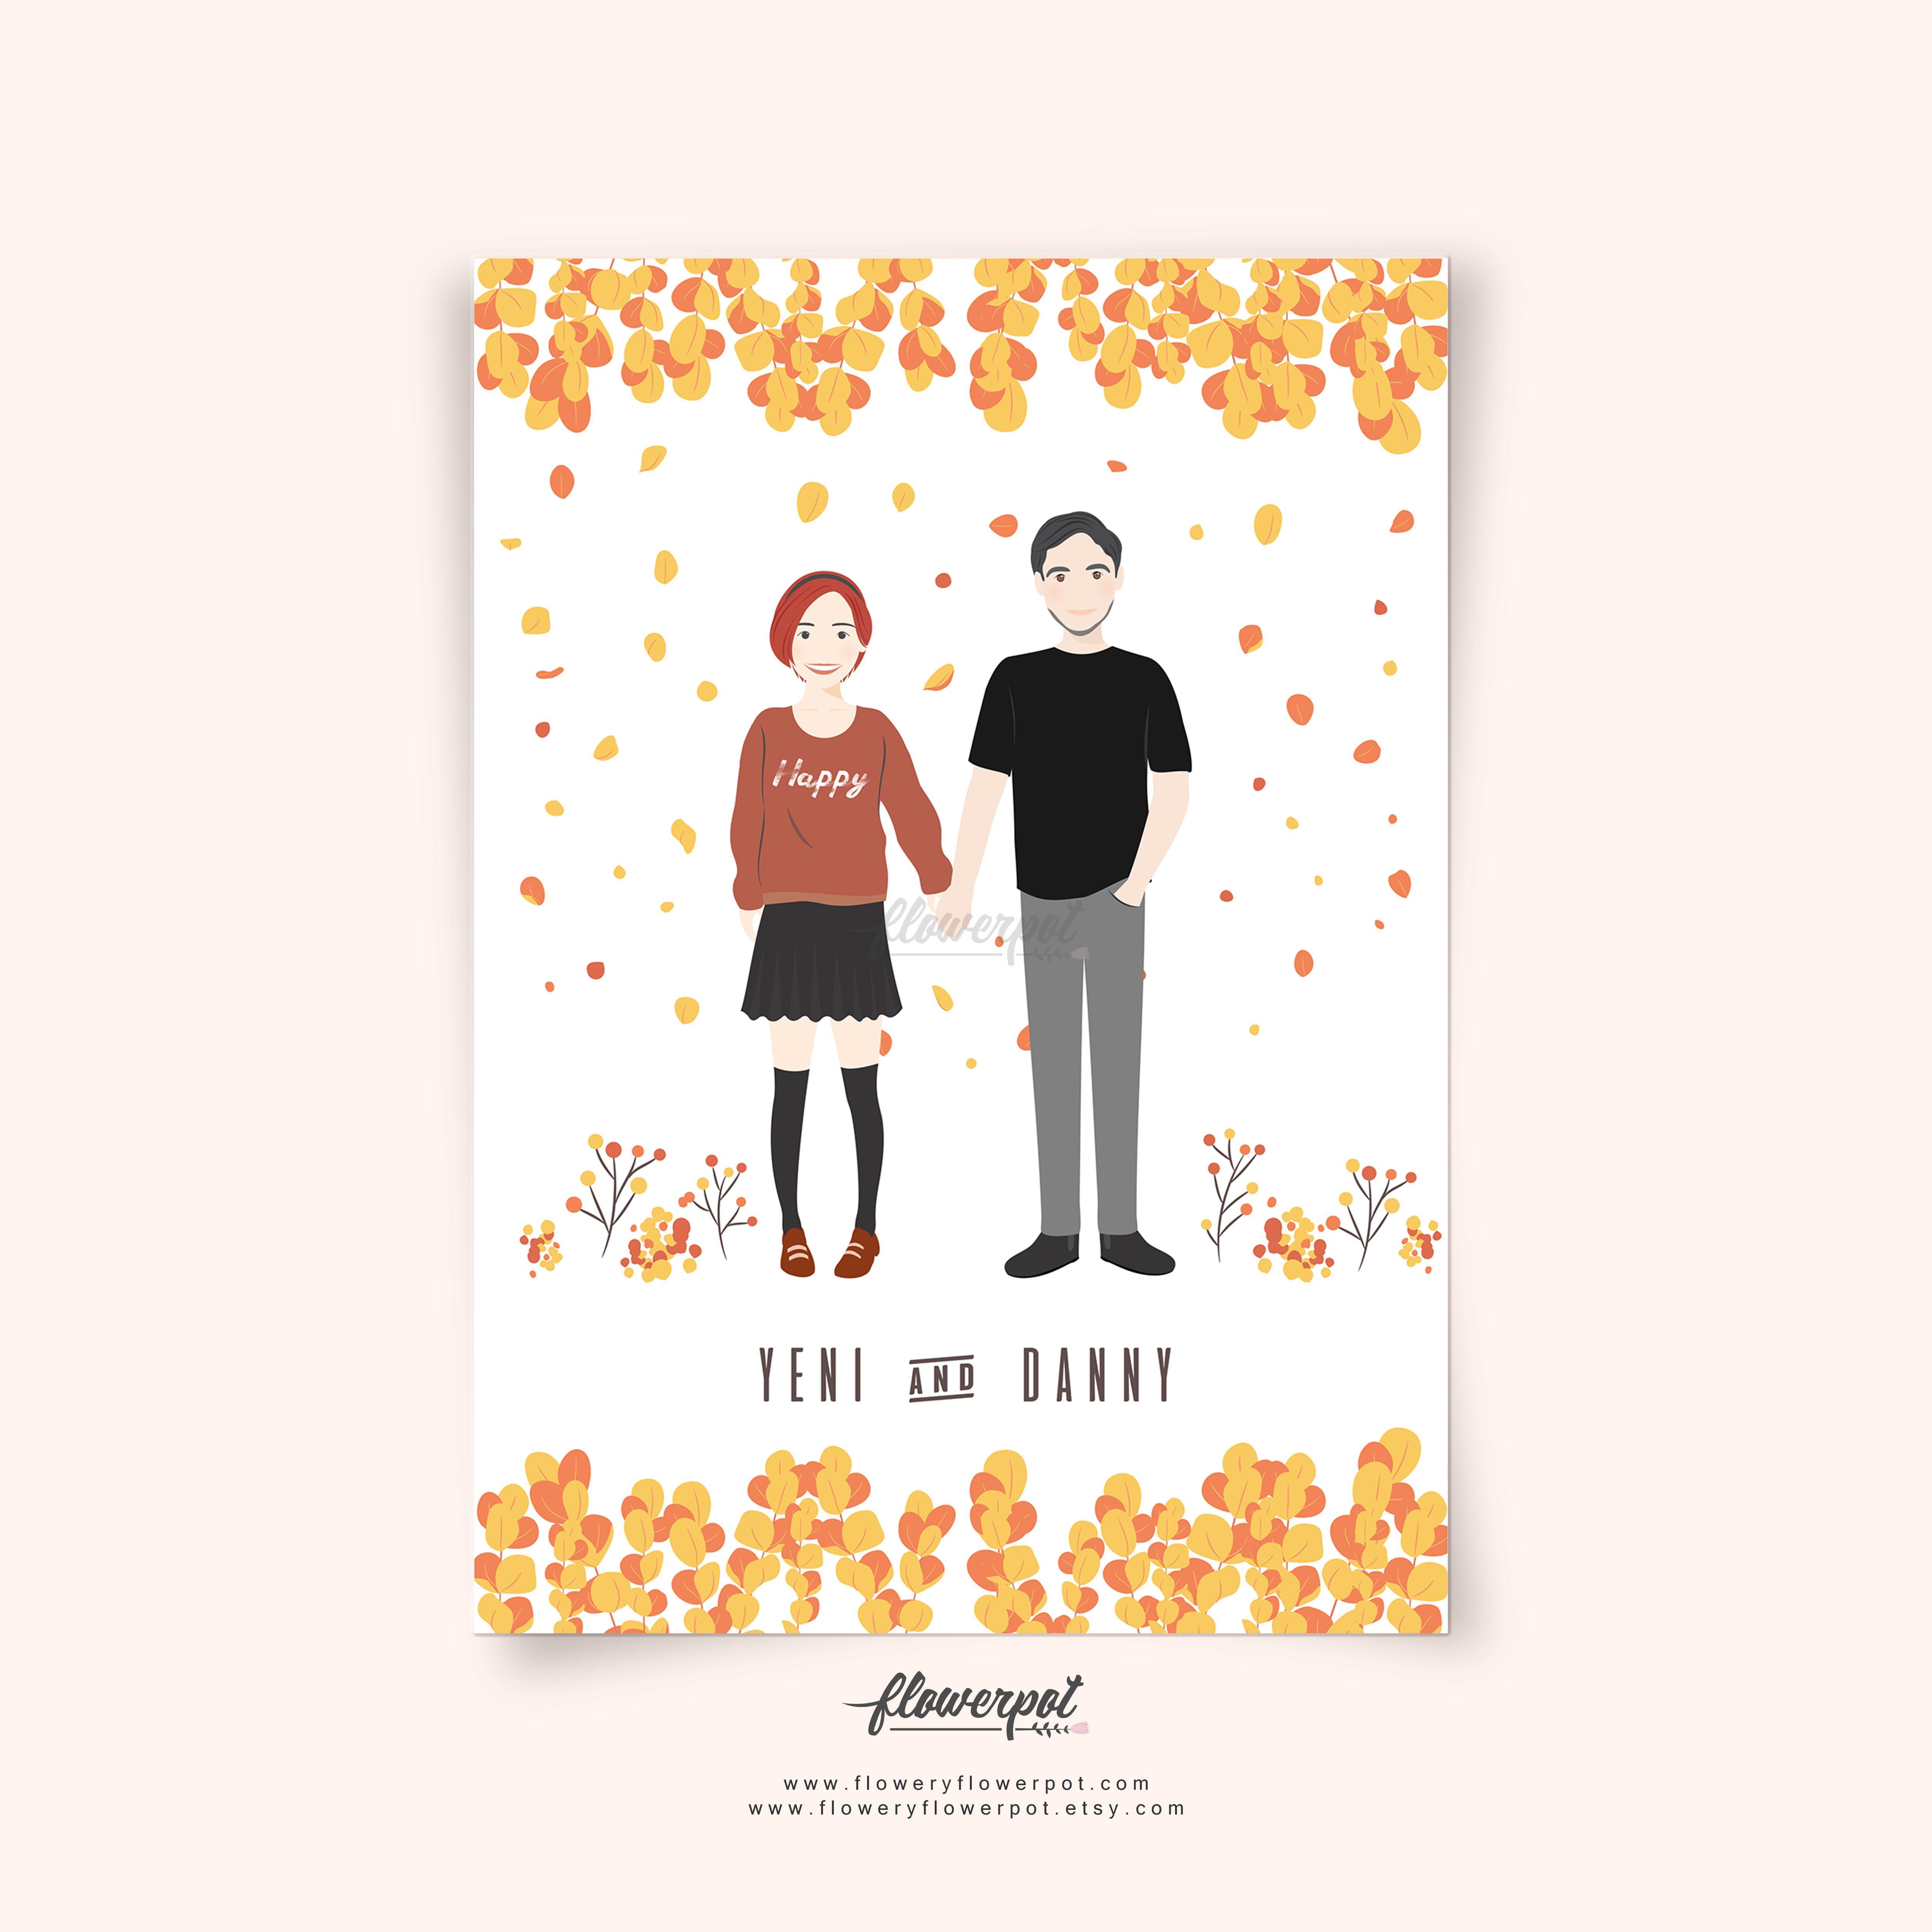 Custom couple portrait illustration wedding anniversary gift